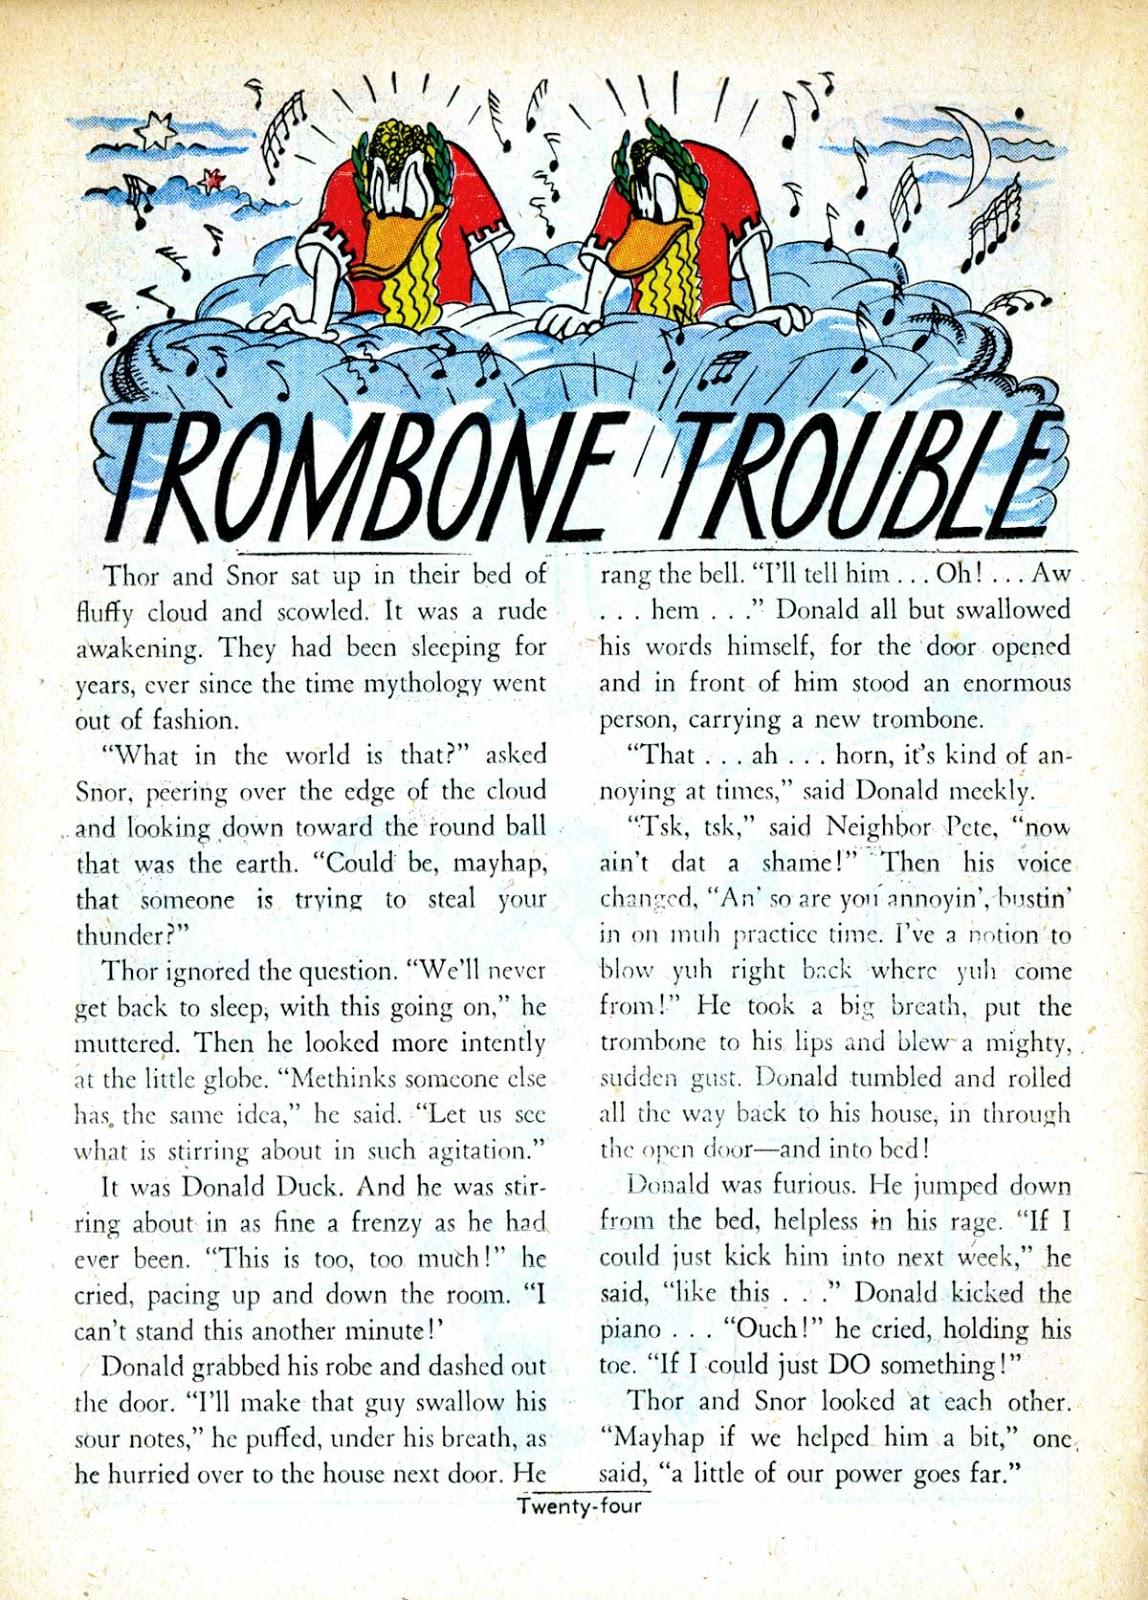 Trombone Trouble (short story)